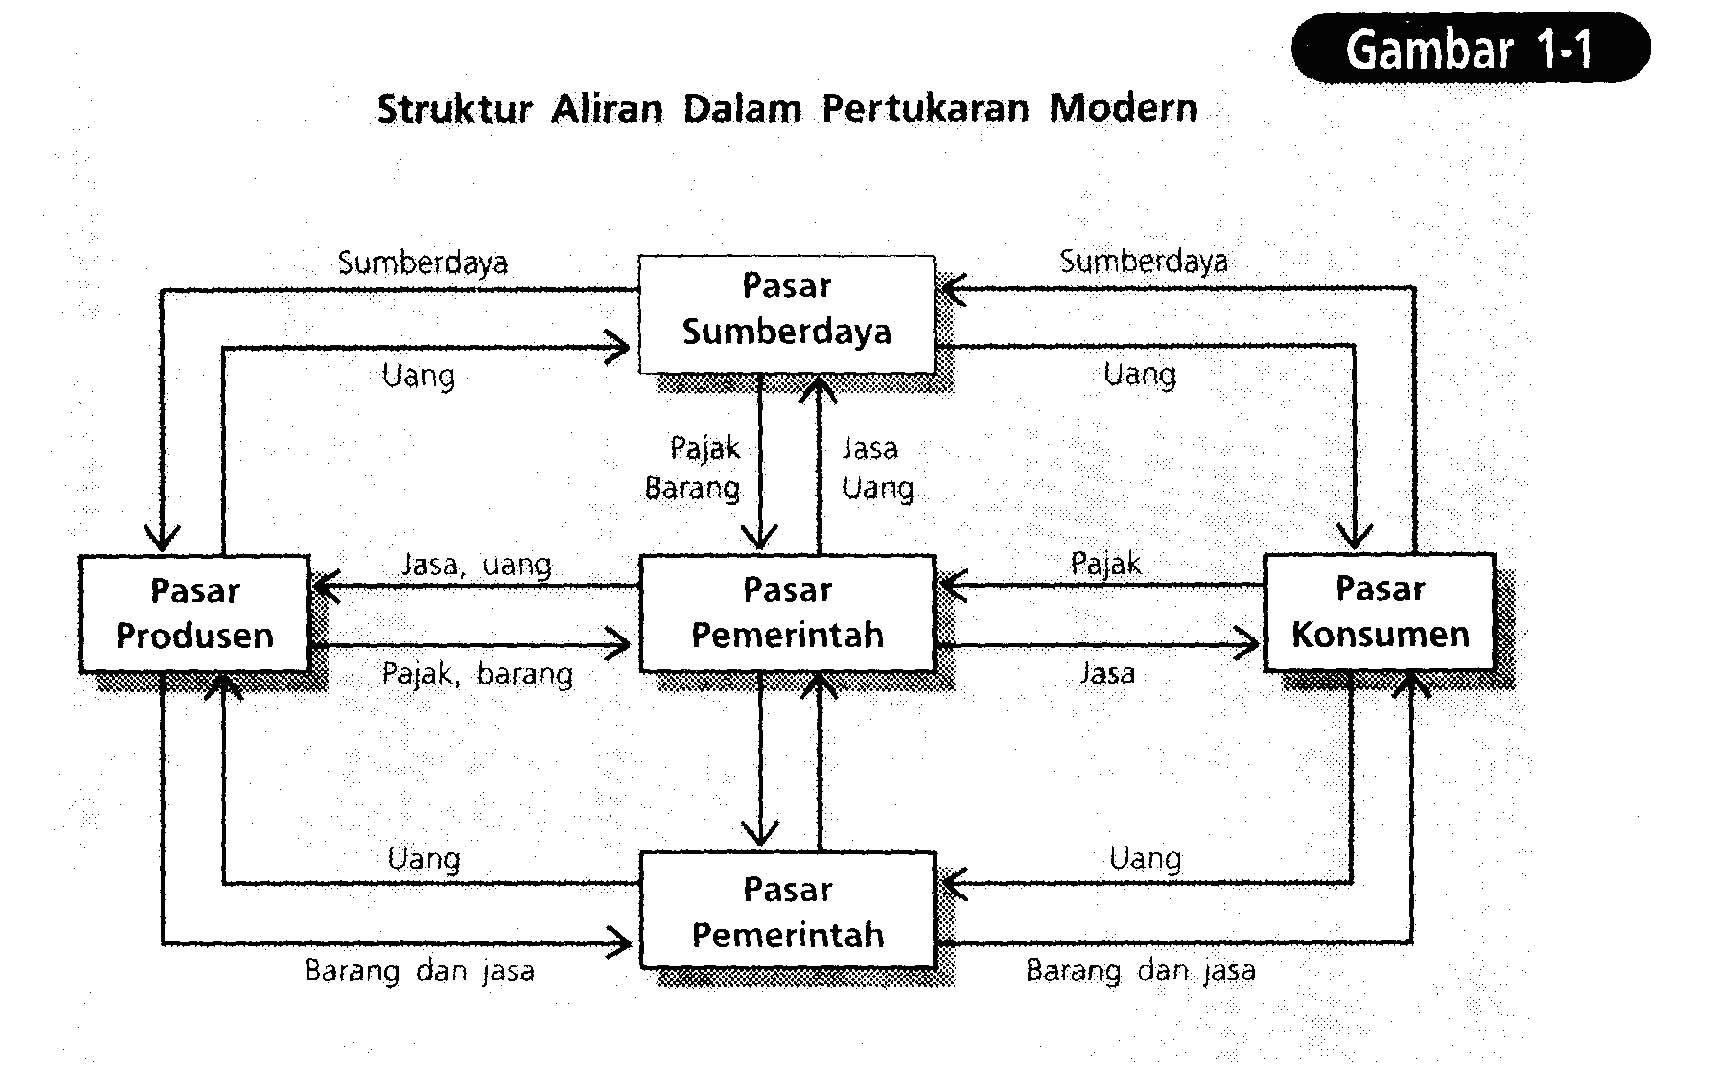 Soal Ukg Sd Net Contoh Soal Osn Sd Bahasa Indonesia Websites Ebookily Net Blog Money Guide